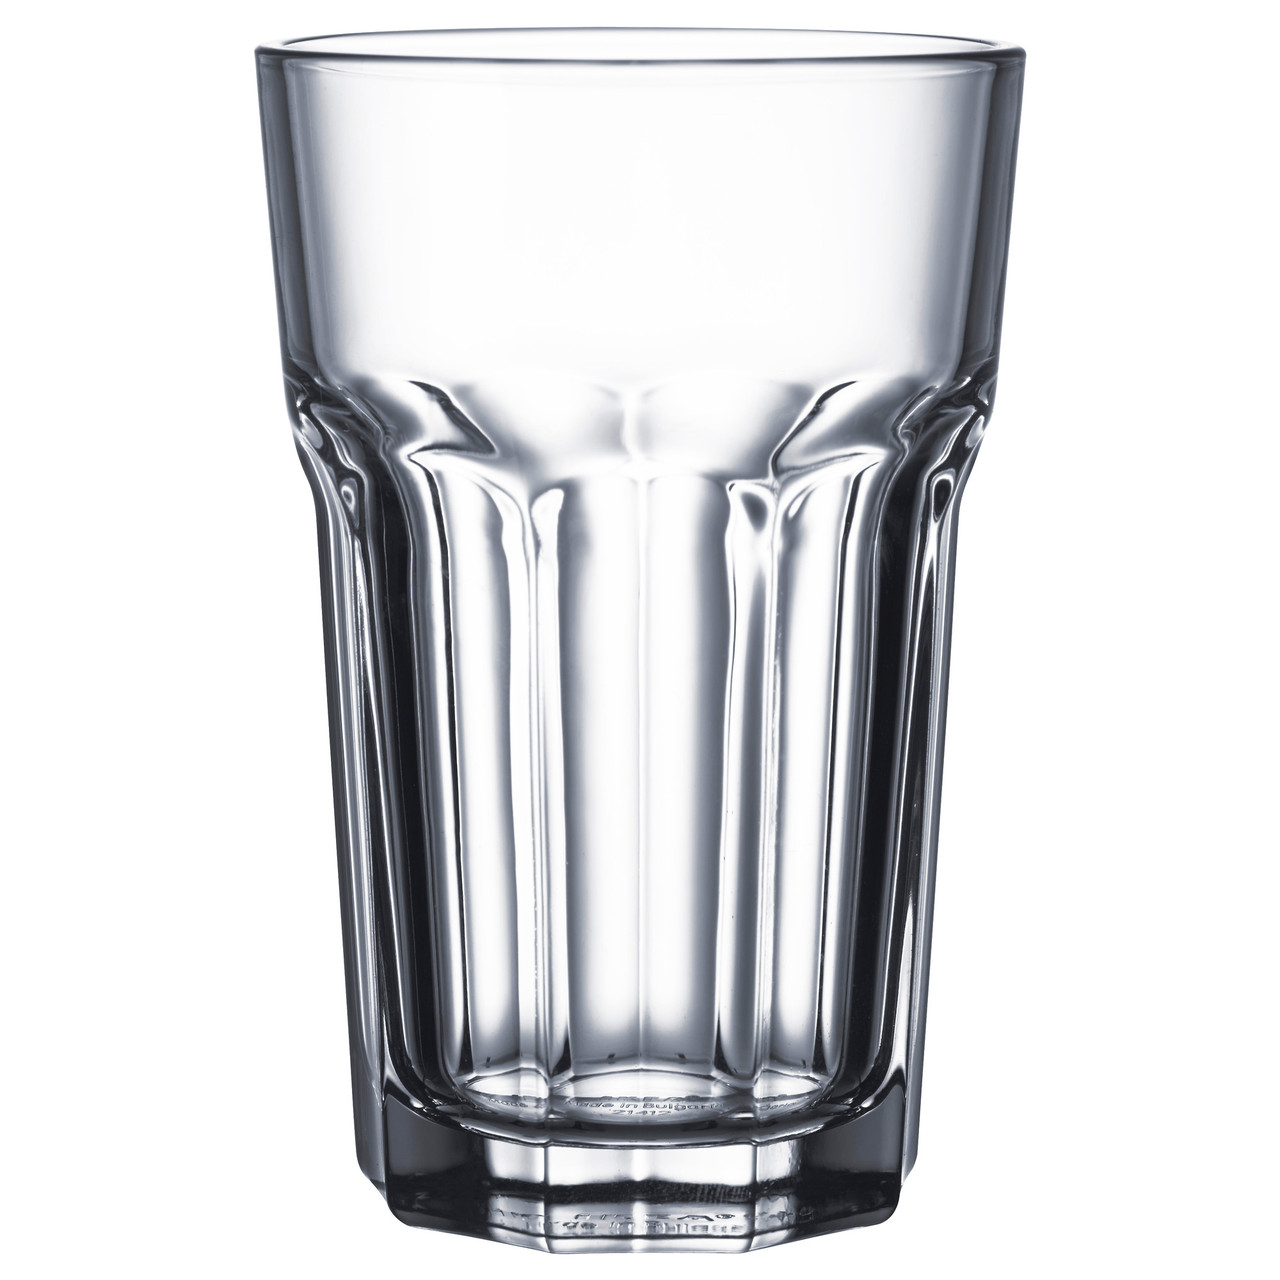 ПОКАЛ Стакан, прозрачное стекло, 350 мл 10270478 IKEA, ИКЕА, POKAL